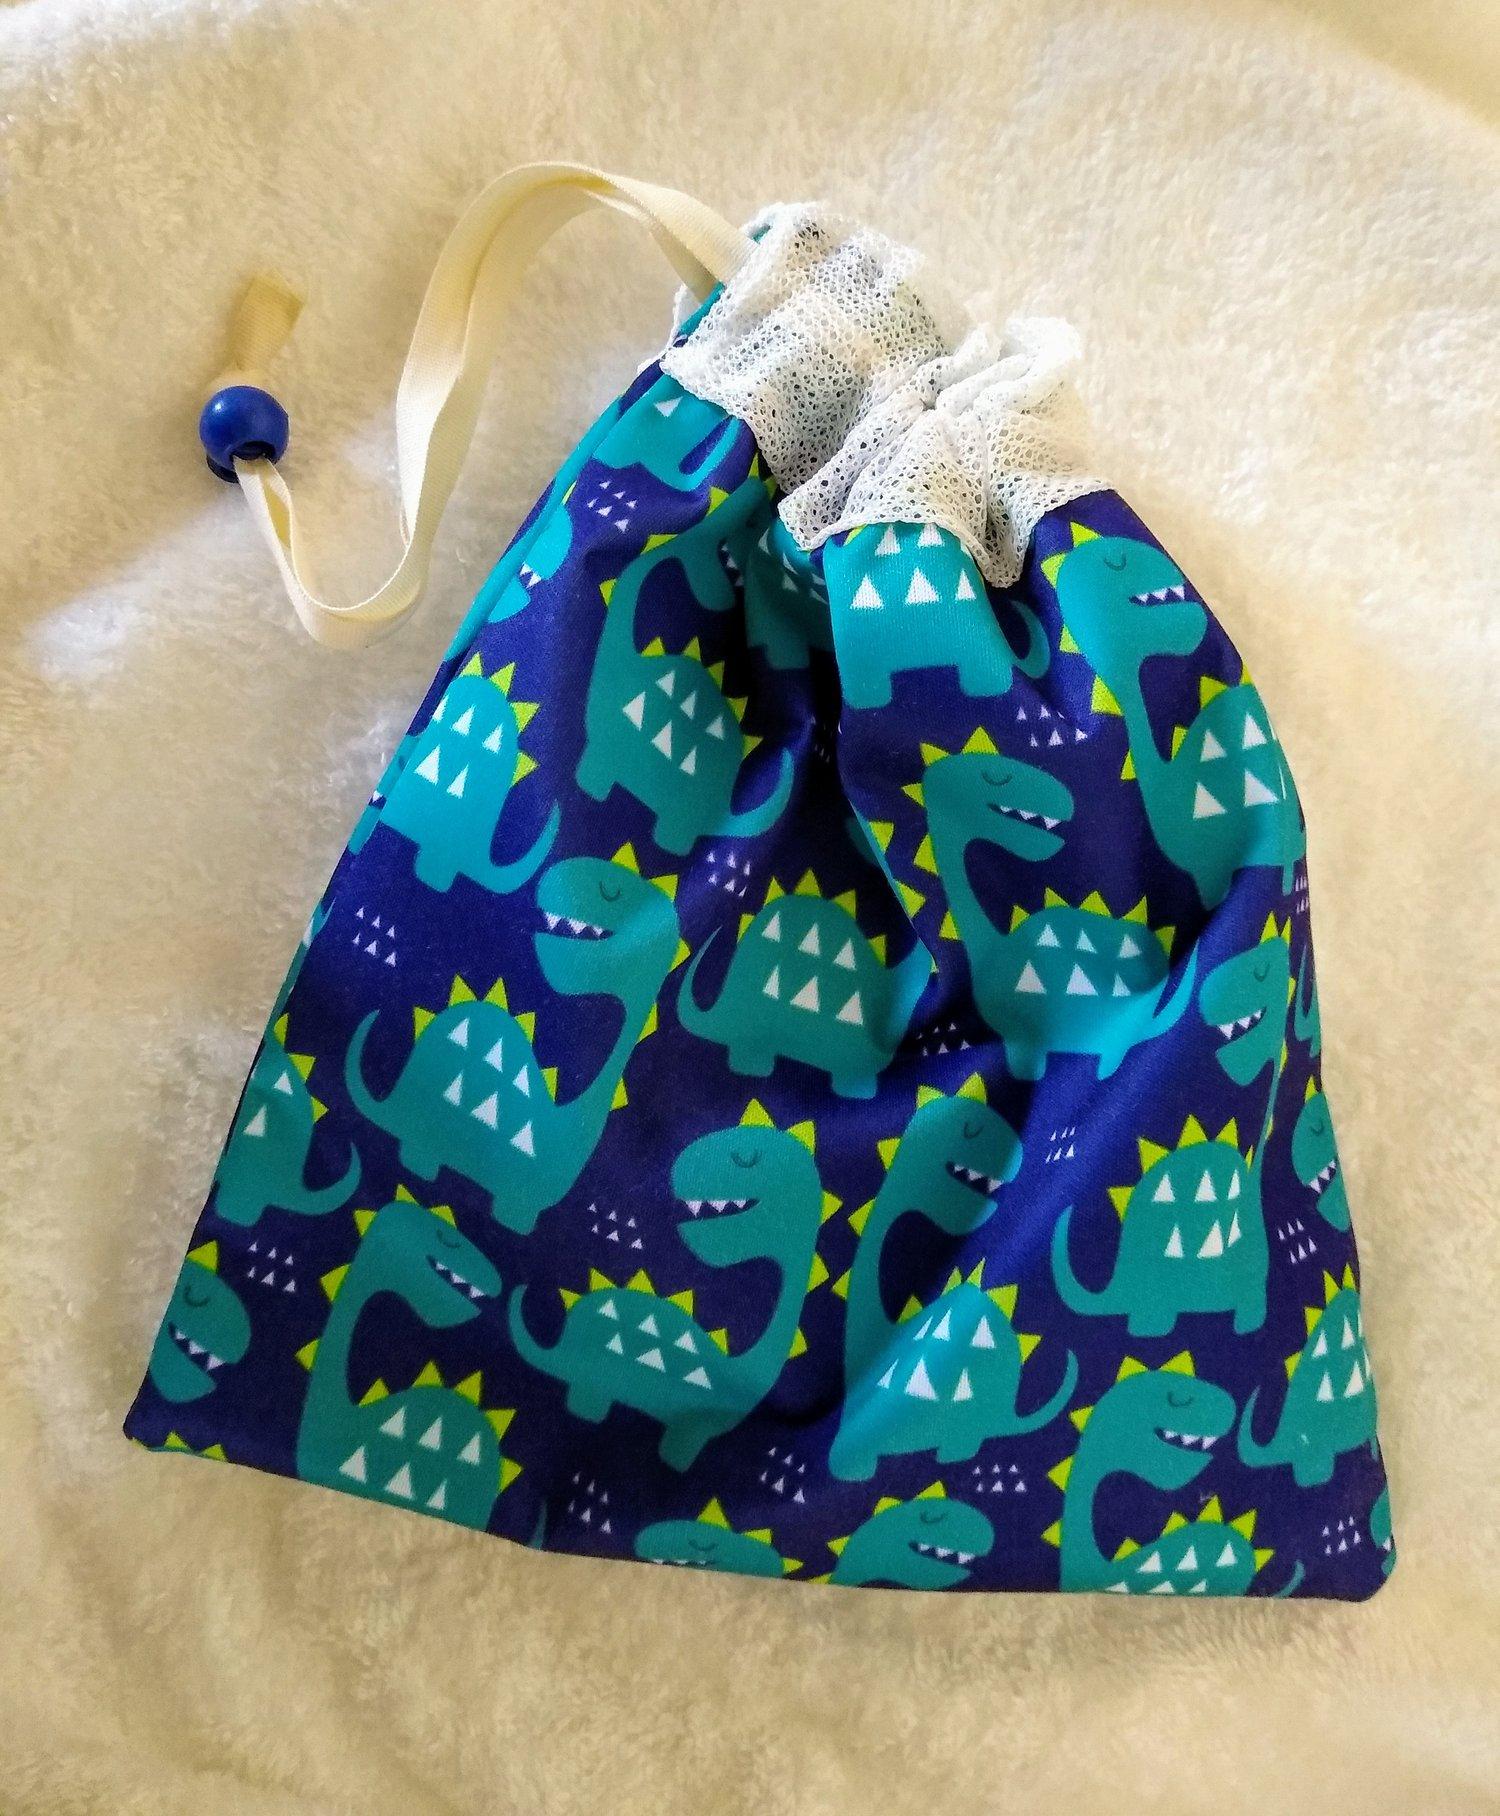 Image of Tubie Pads, Cloth Wipes Storage bag